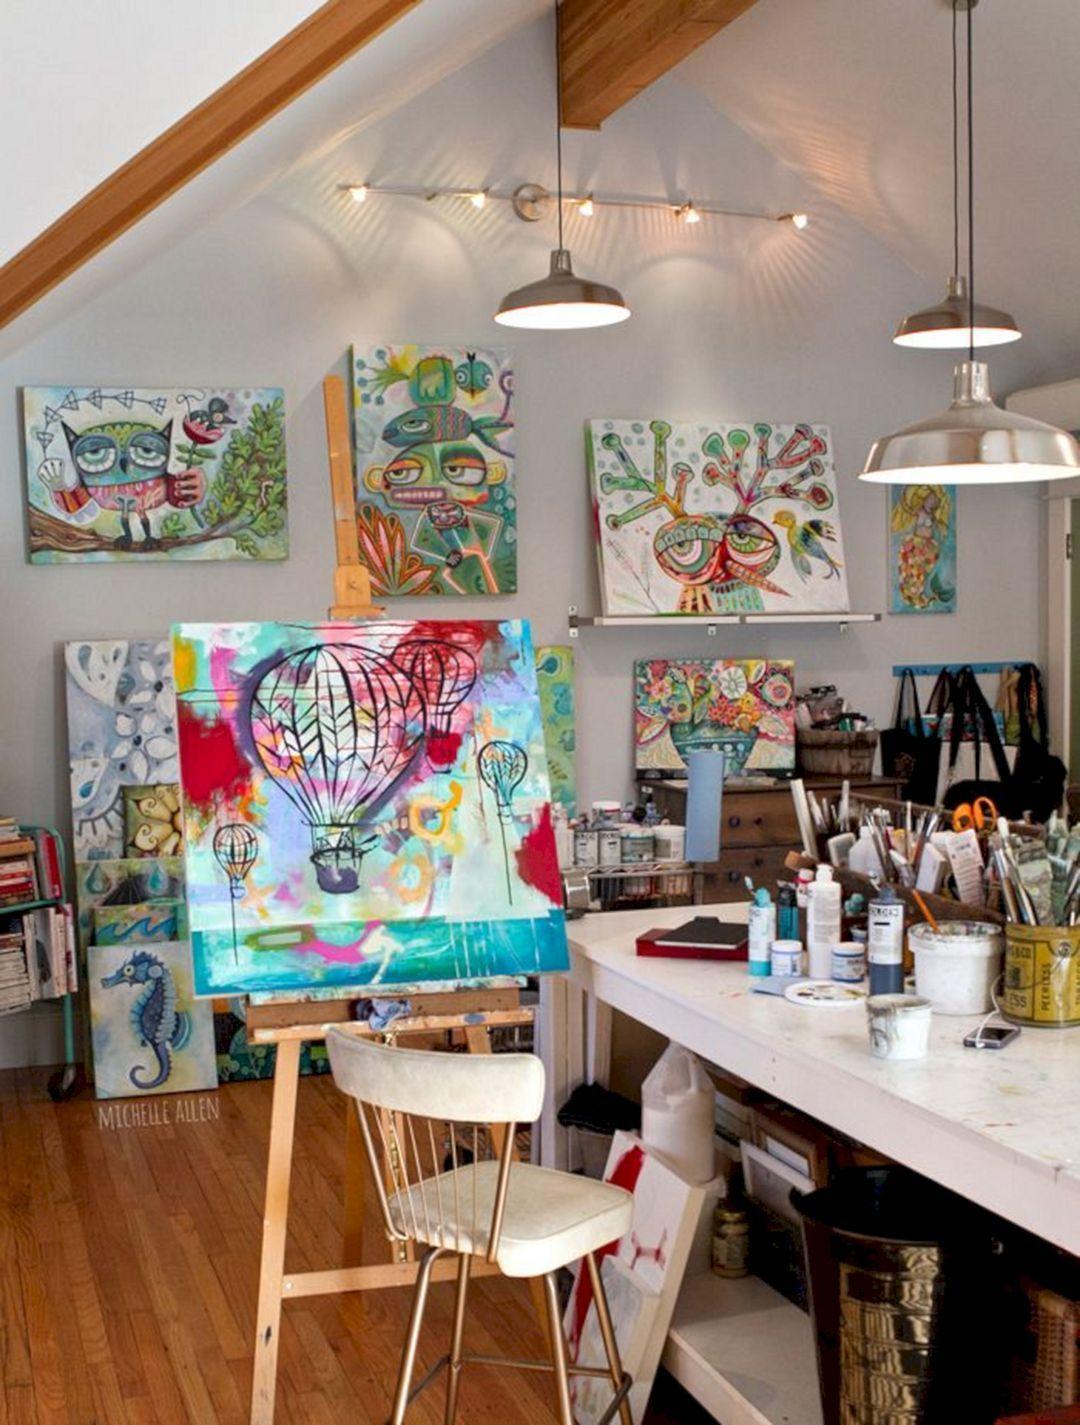 5 Stunning Art Studio Design Ideas For Small Spaces Freshouz Com Art Studio At Home Art Studio Decor Art Studio Space